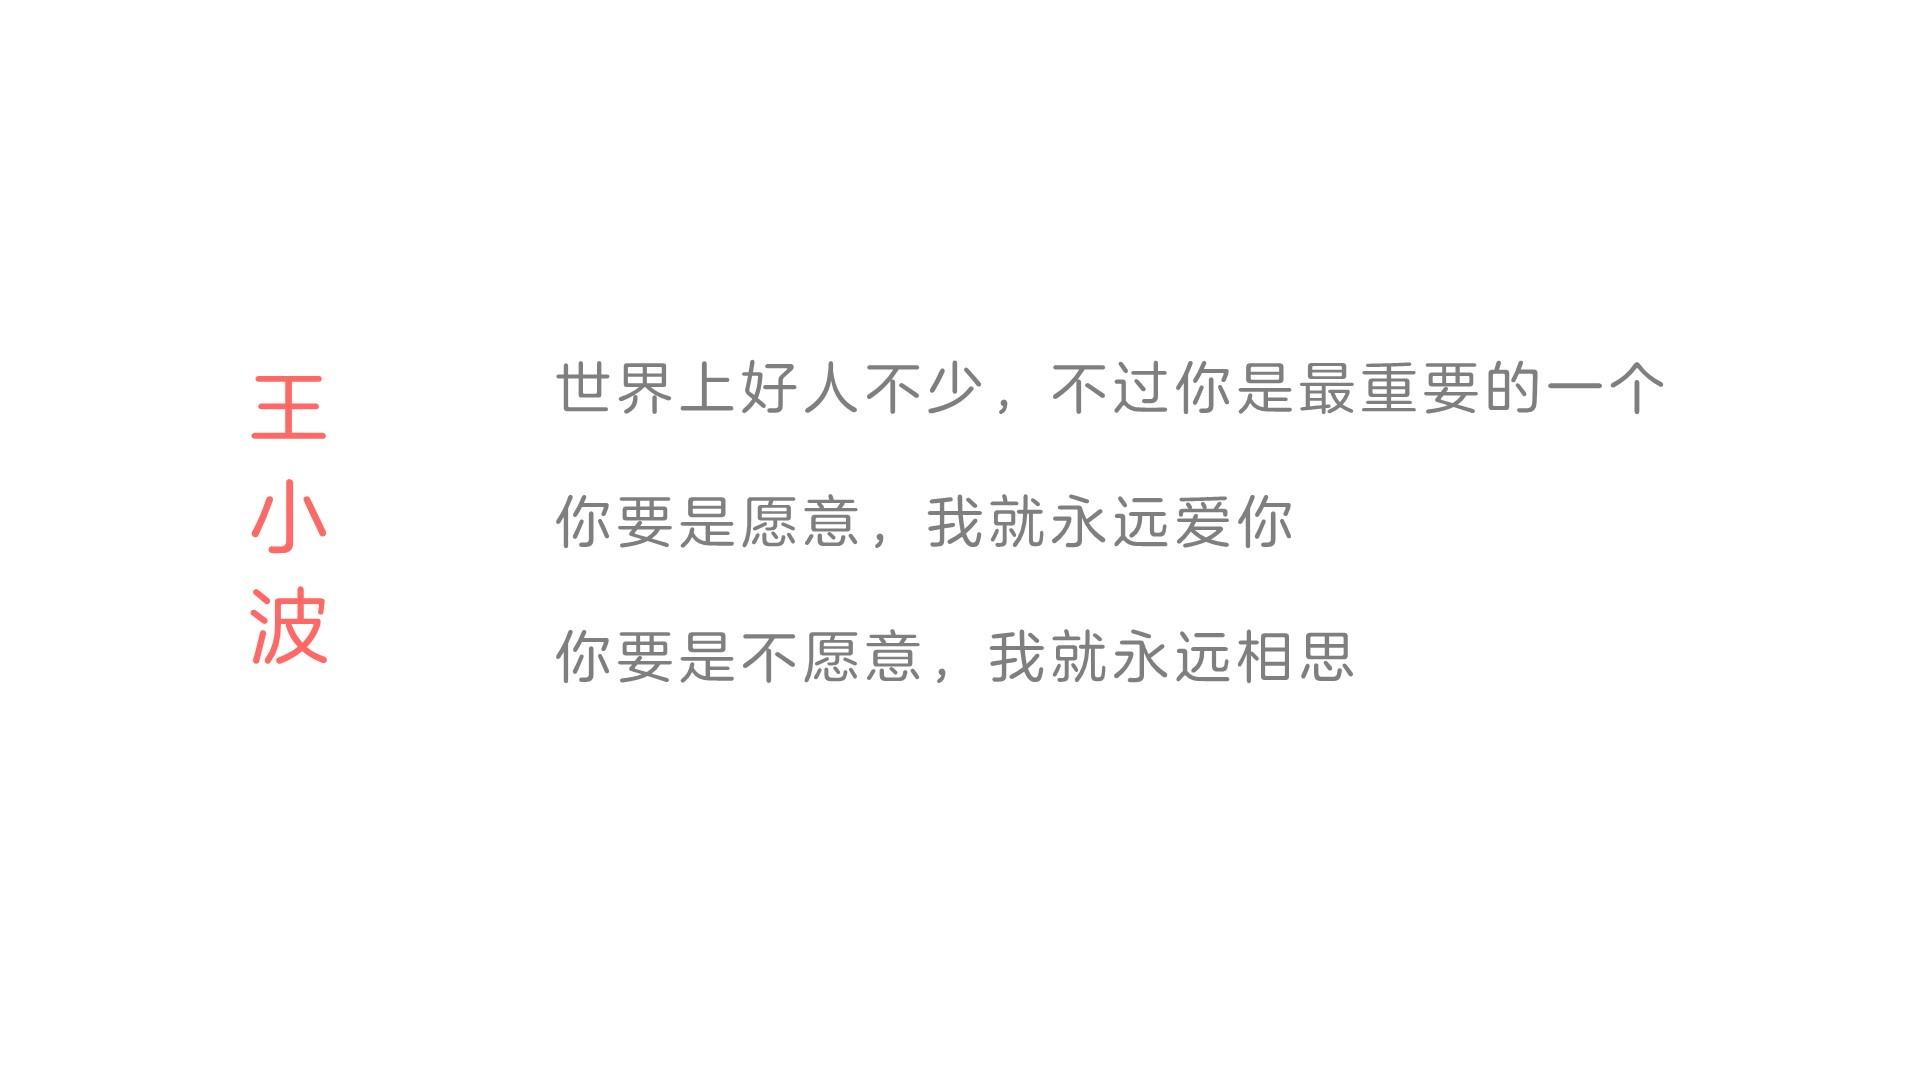 PPT文本排版基础浅谈二 君陵的PPT小院杂谈14